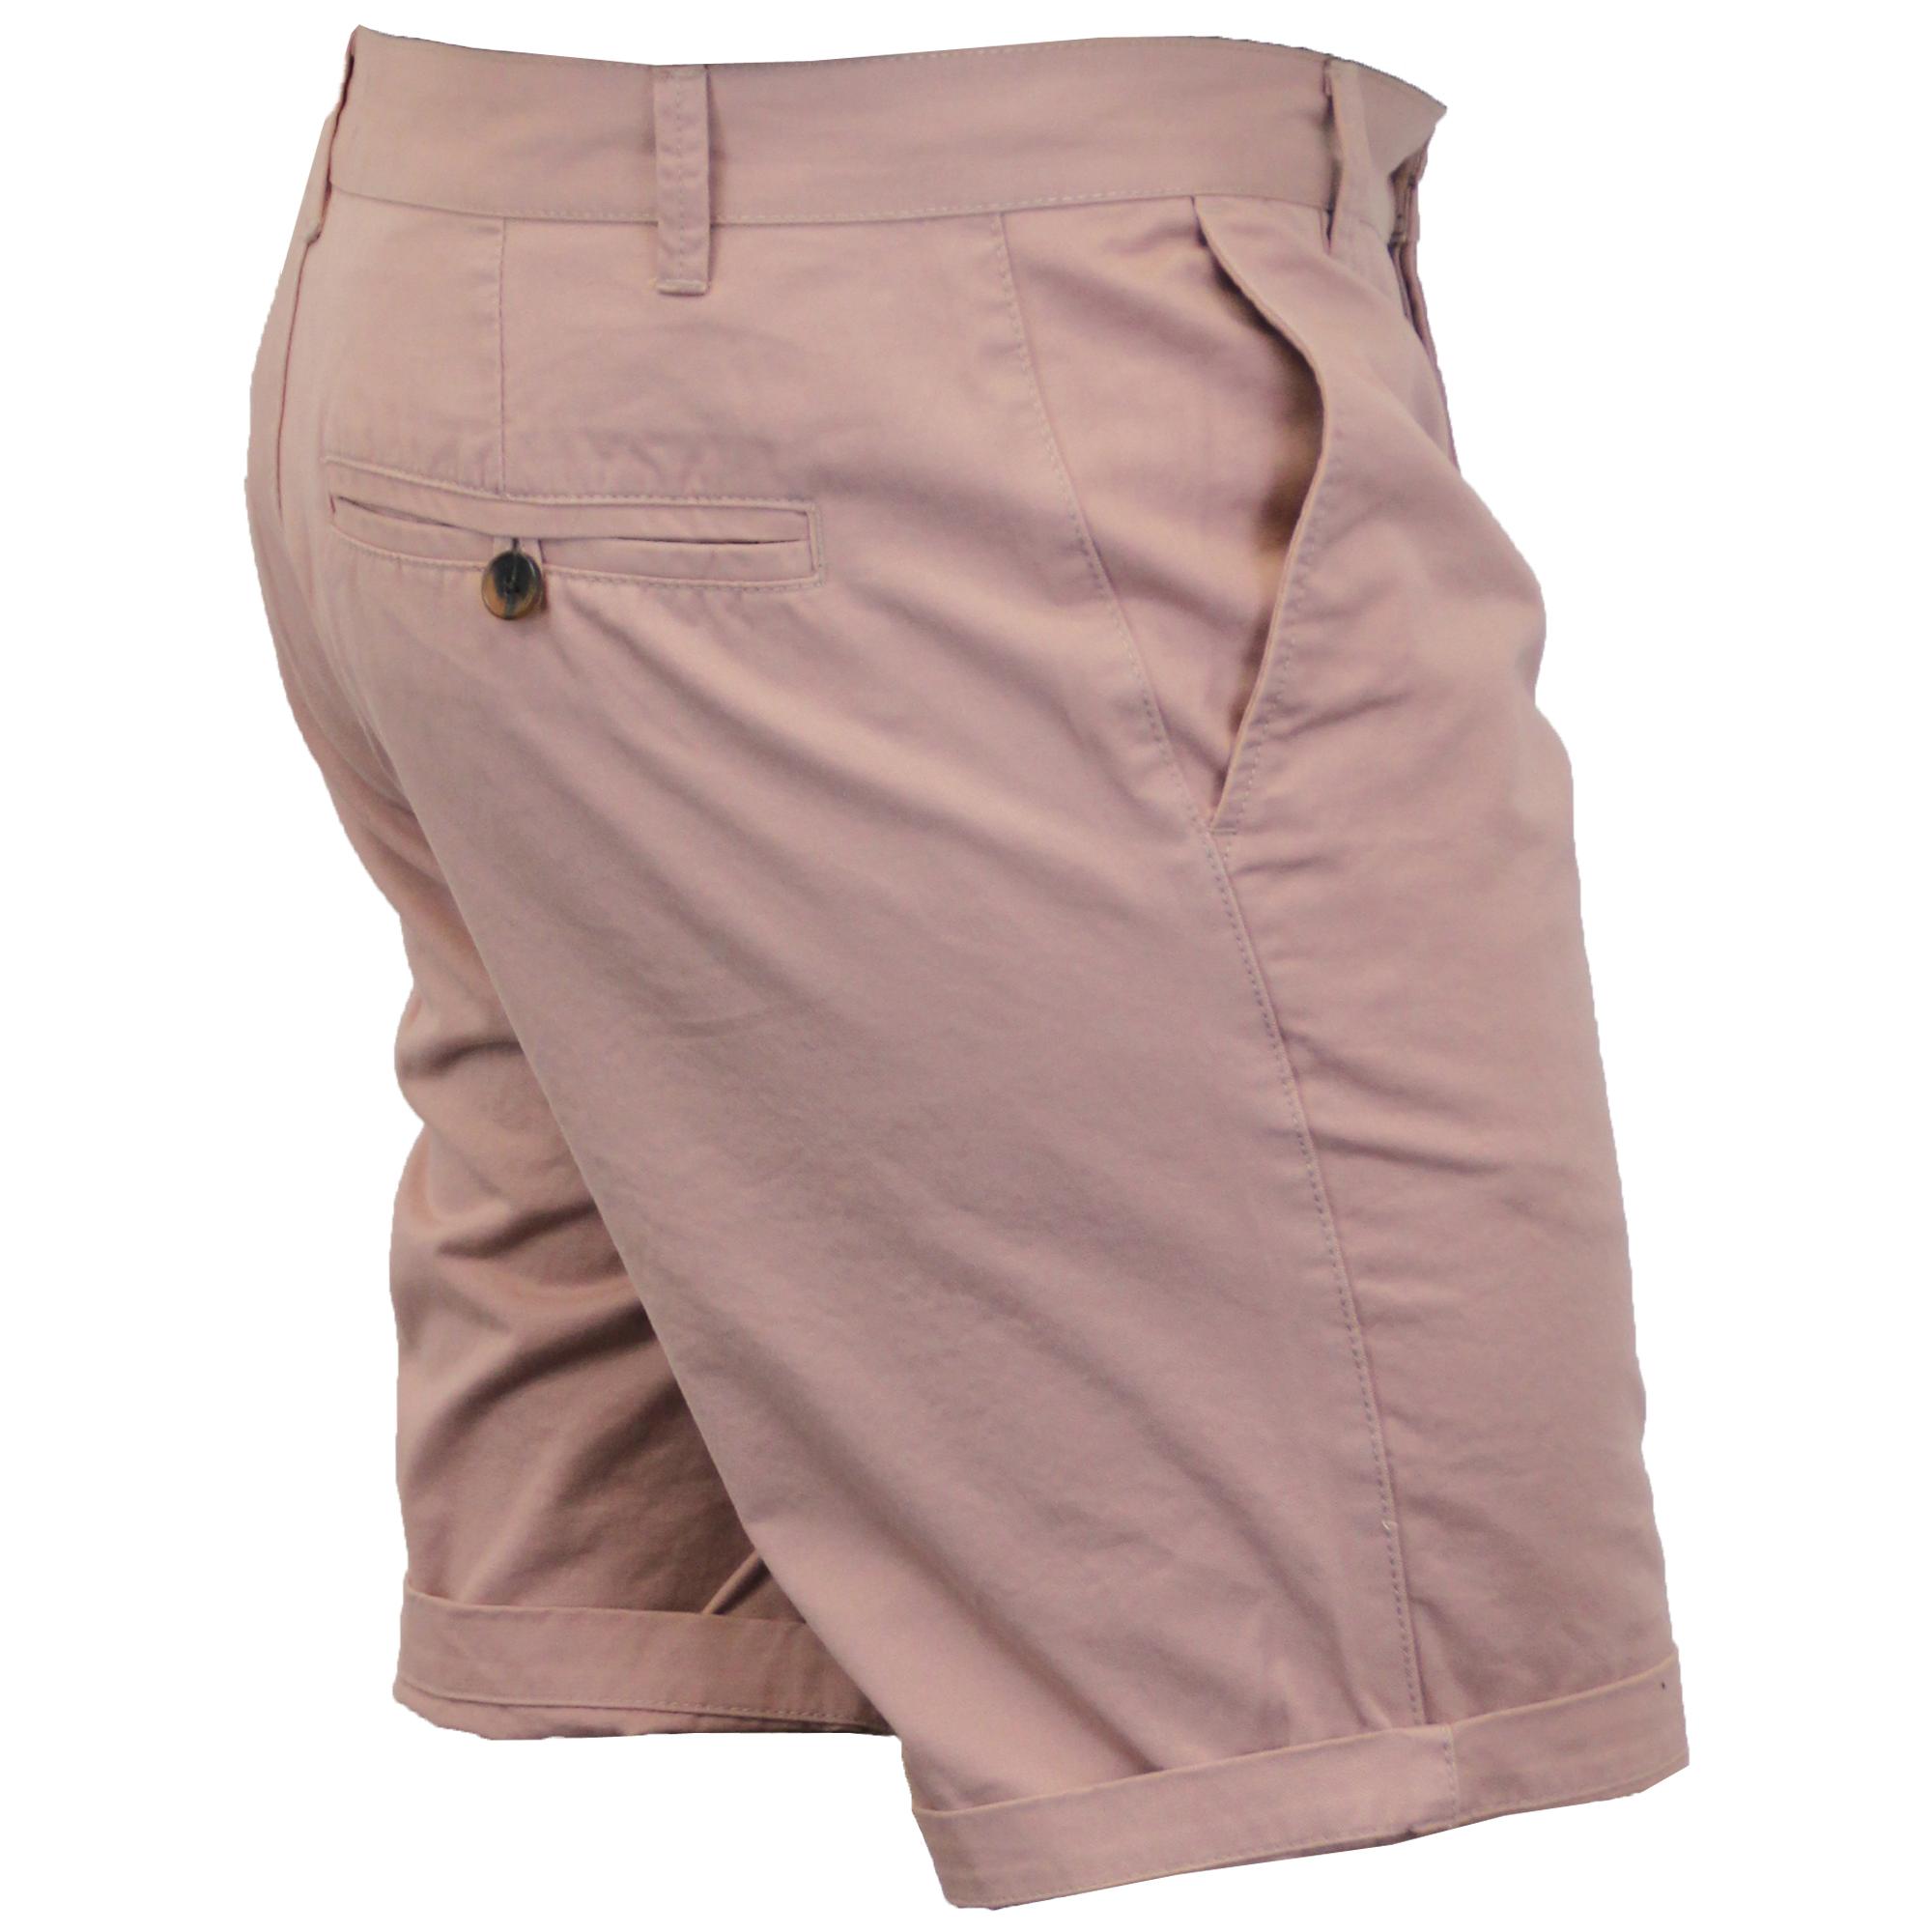 Mens Chino Shorts Threadbare Pants Westace Stallion Knee Length Roll Up Summer